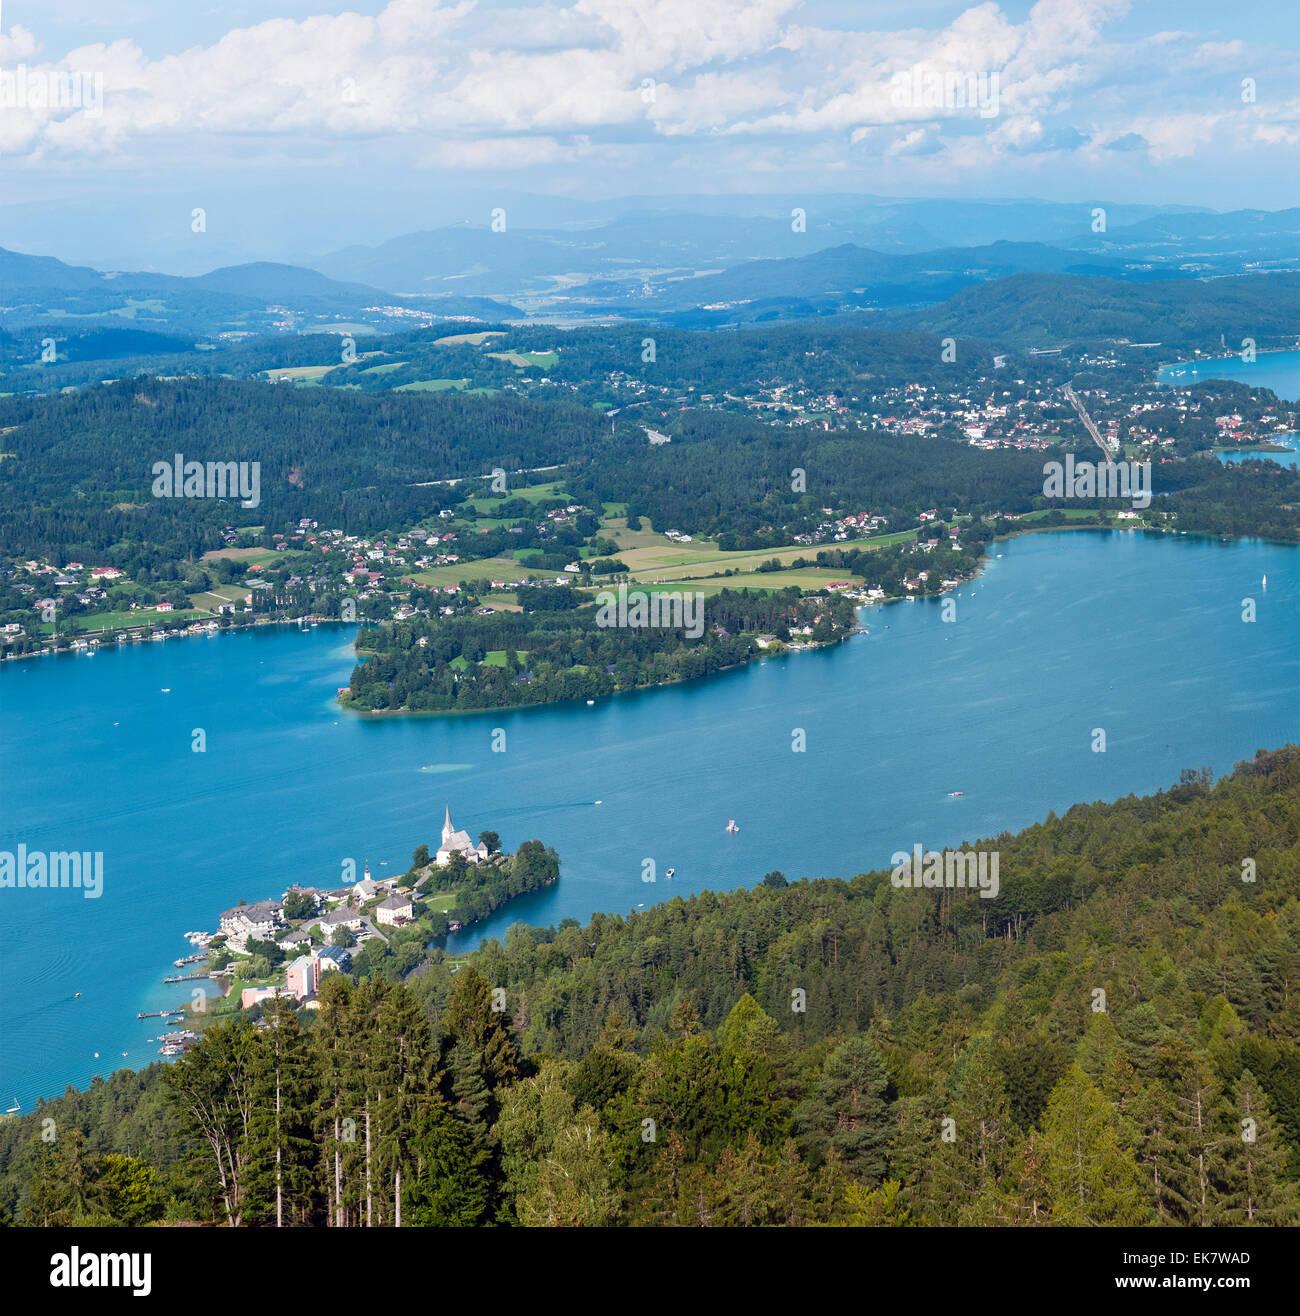 Panorama of Lake W├Ârthersee, bird's-eye view, Austria Stock Photo